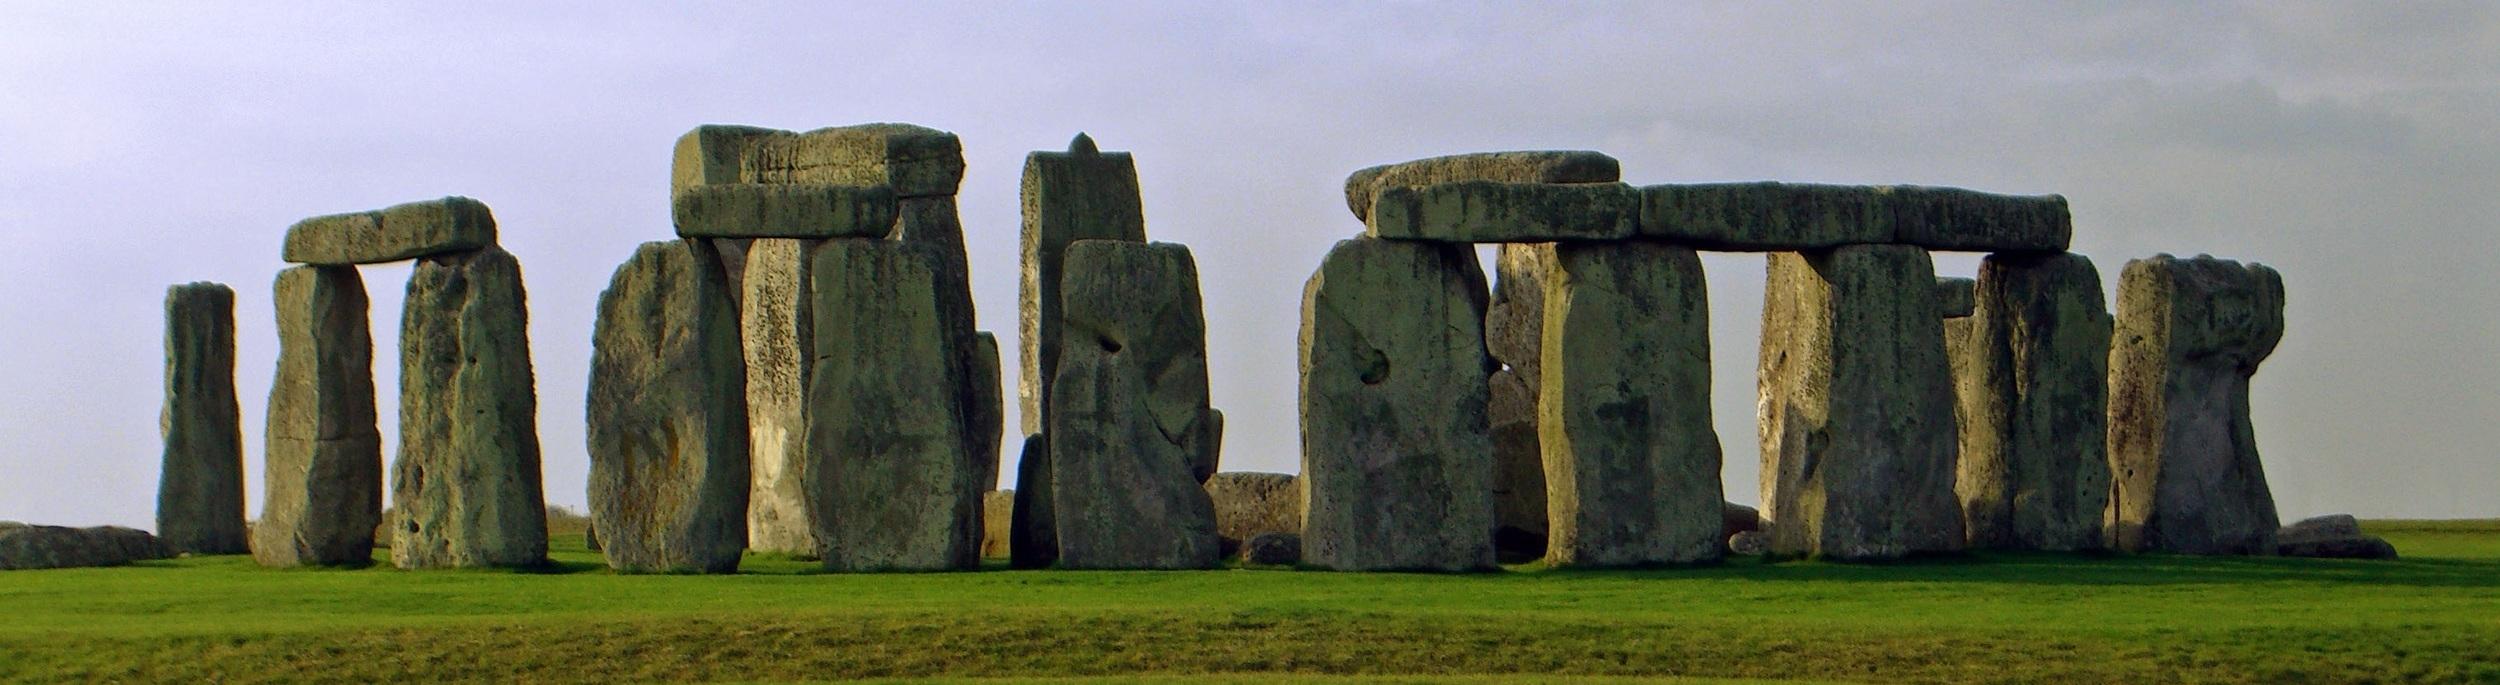 Stonehenge Summer Solstice.jpg